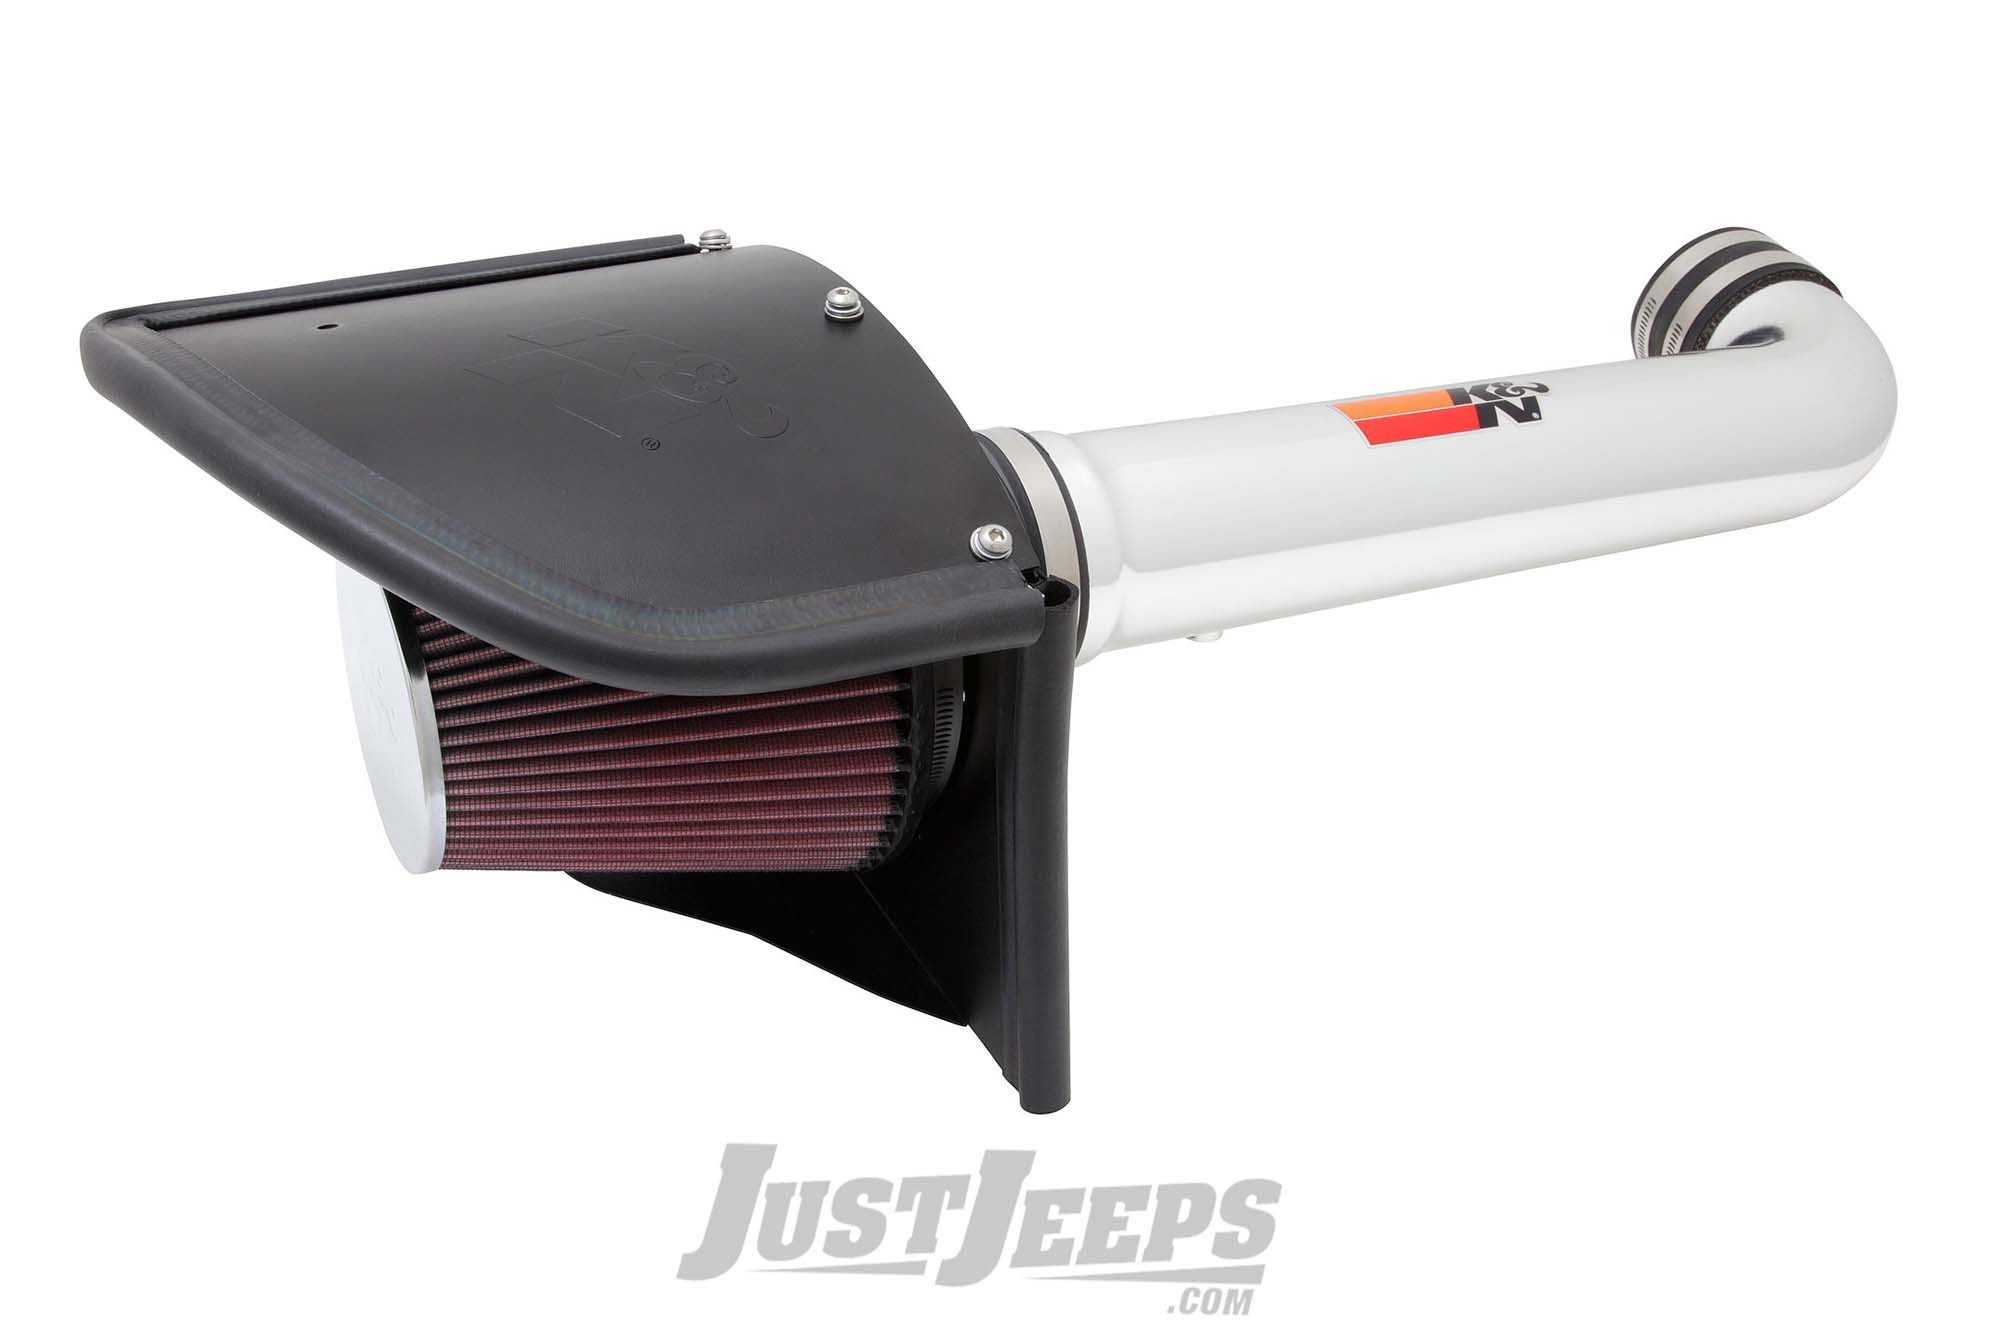 K&N 3.6L 77 Series High Flow Air Intake For 2012-18 Jeep Wrangler JK 2 Door & Unlimited 4 Door Models